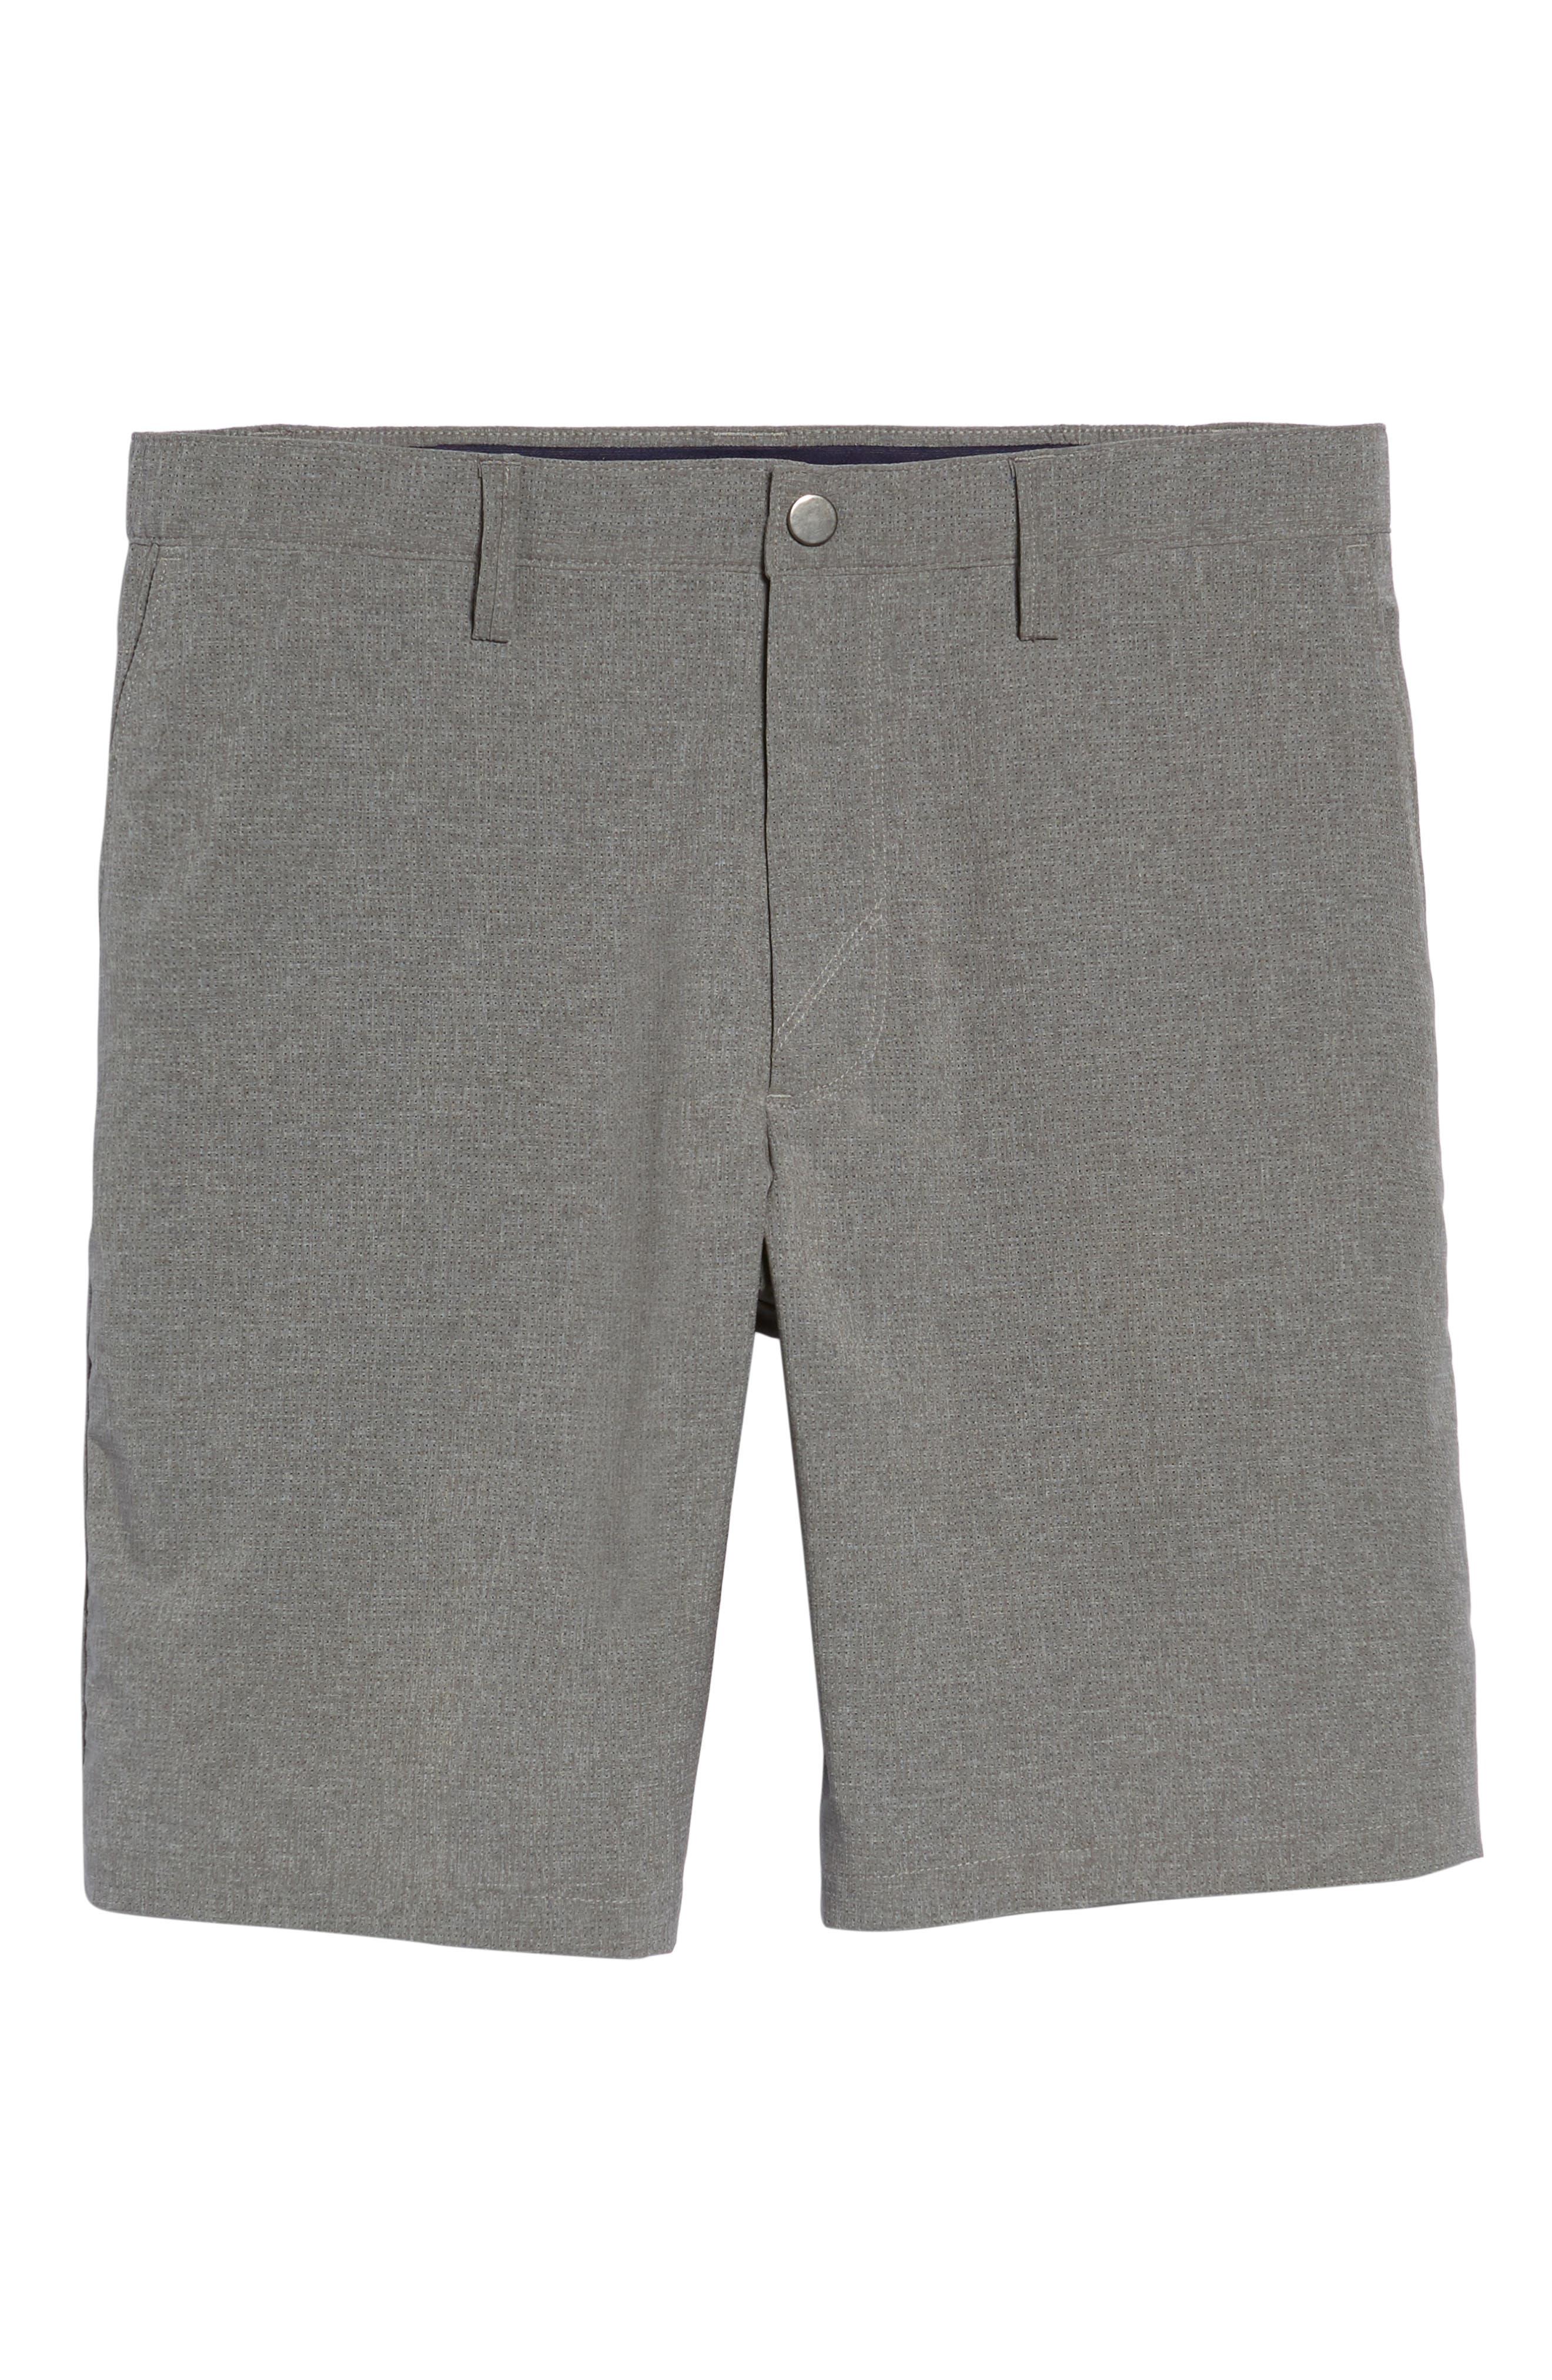 Windsor Active Classic Fit Shorts,                             Alternate thumbnail 6, color,                             GRAVEL